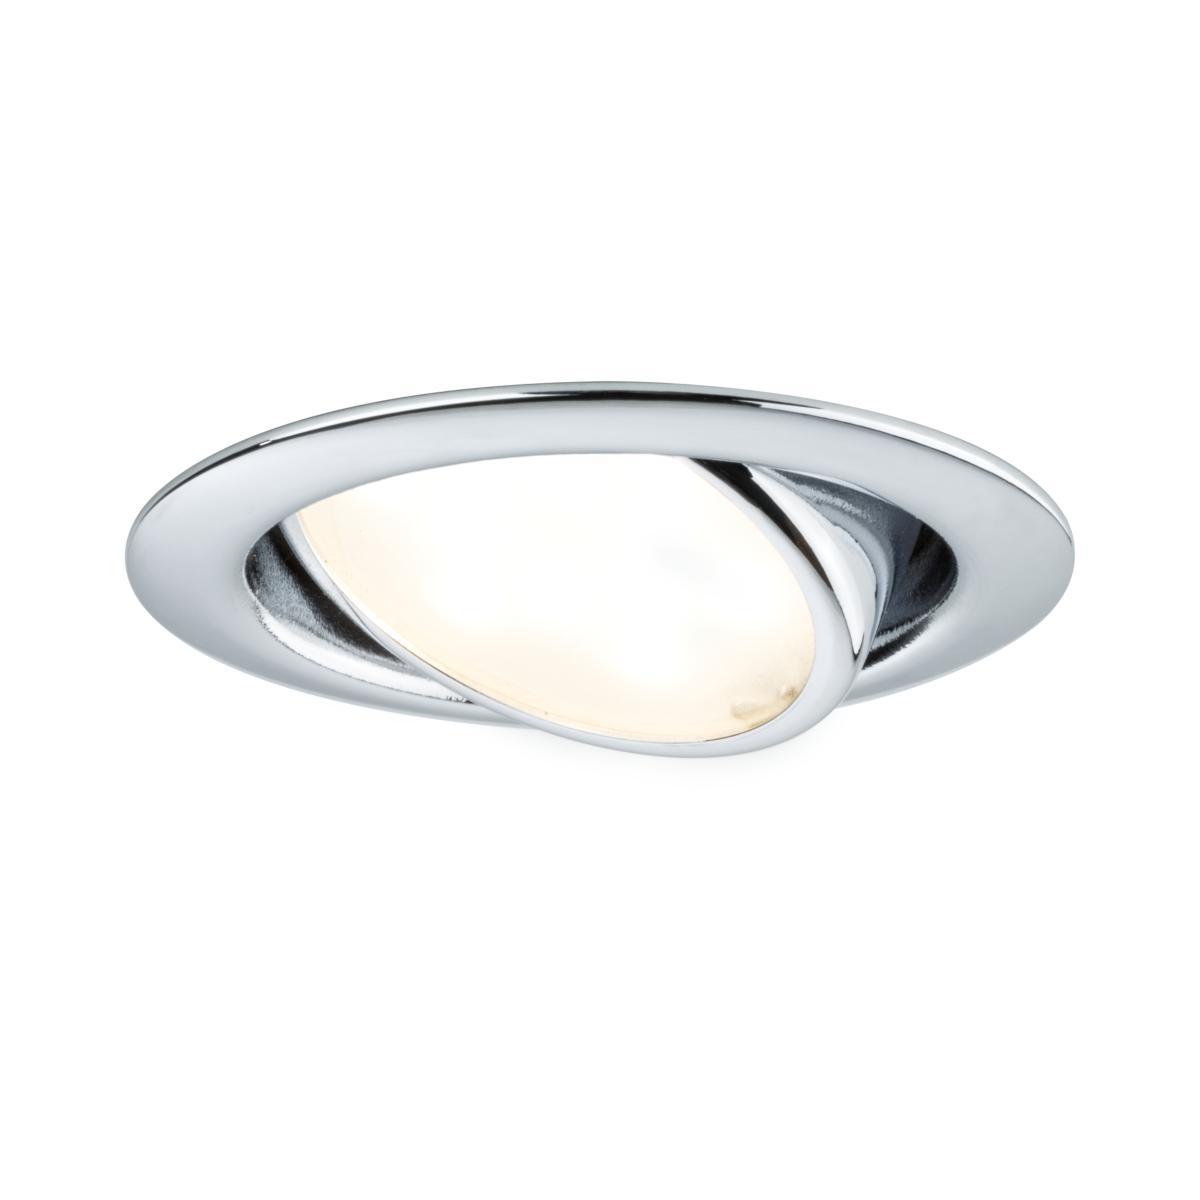 spot led extra plat encastrable orientable 42w chrom paulmann 92088